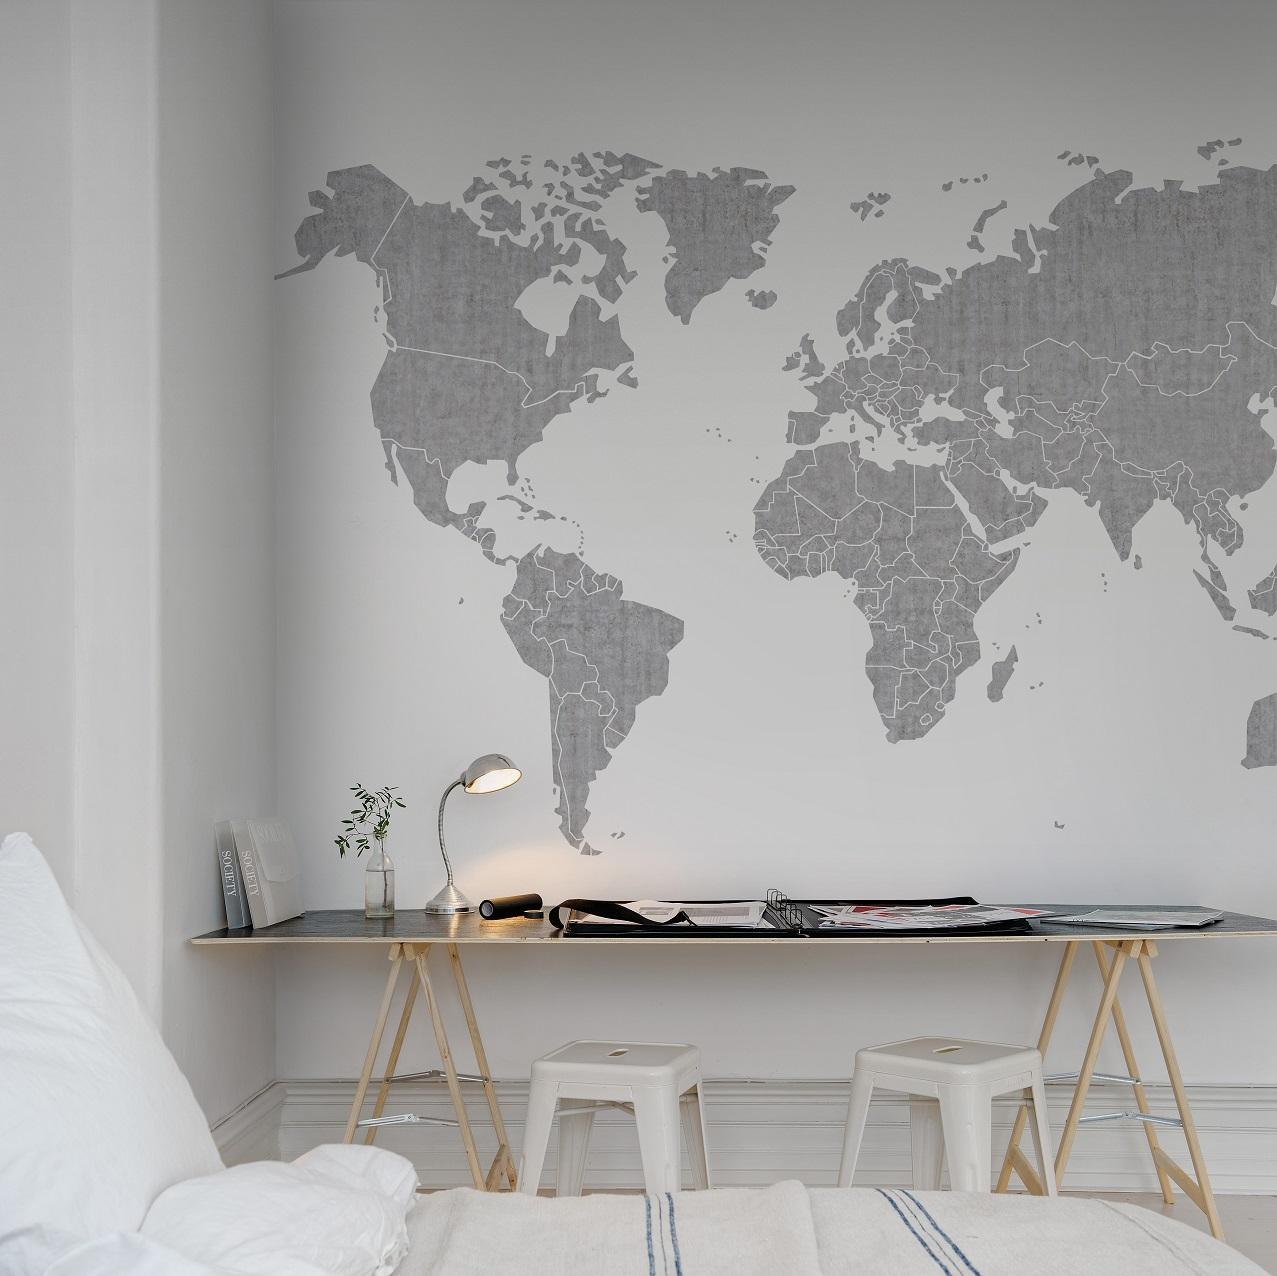 Rebel Walls behang wereldkaart #behang #wereldkaart